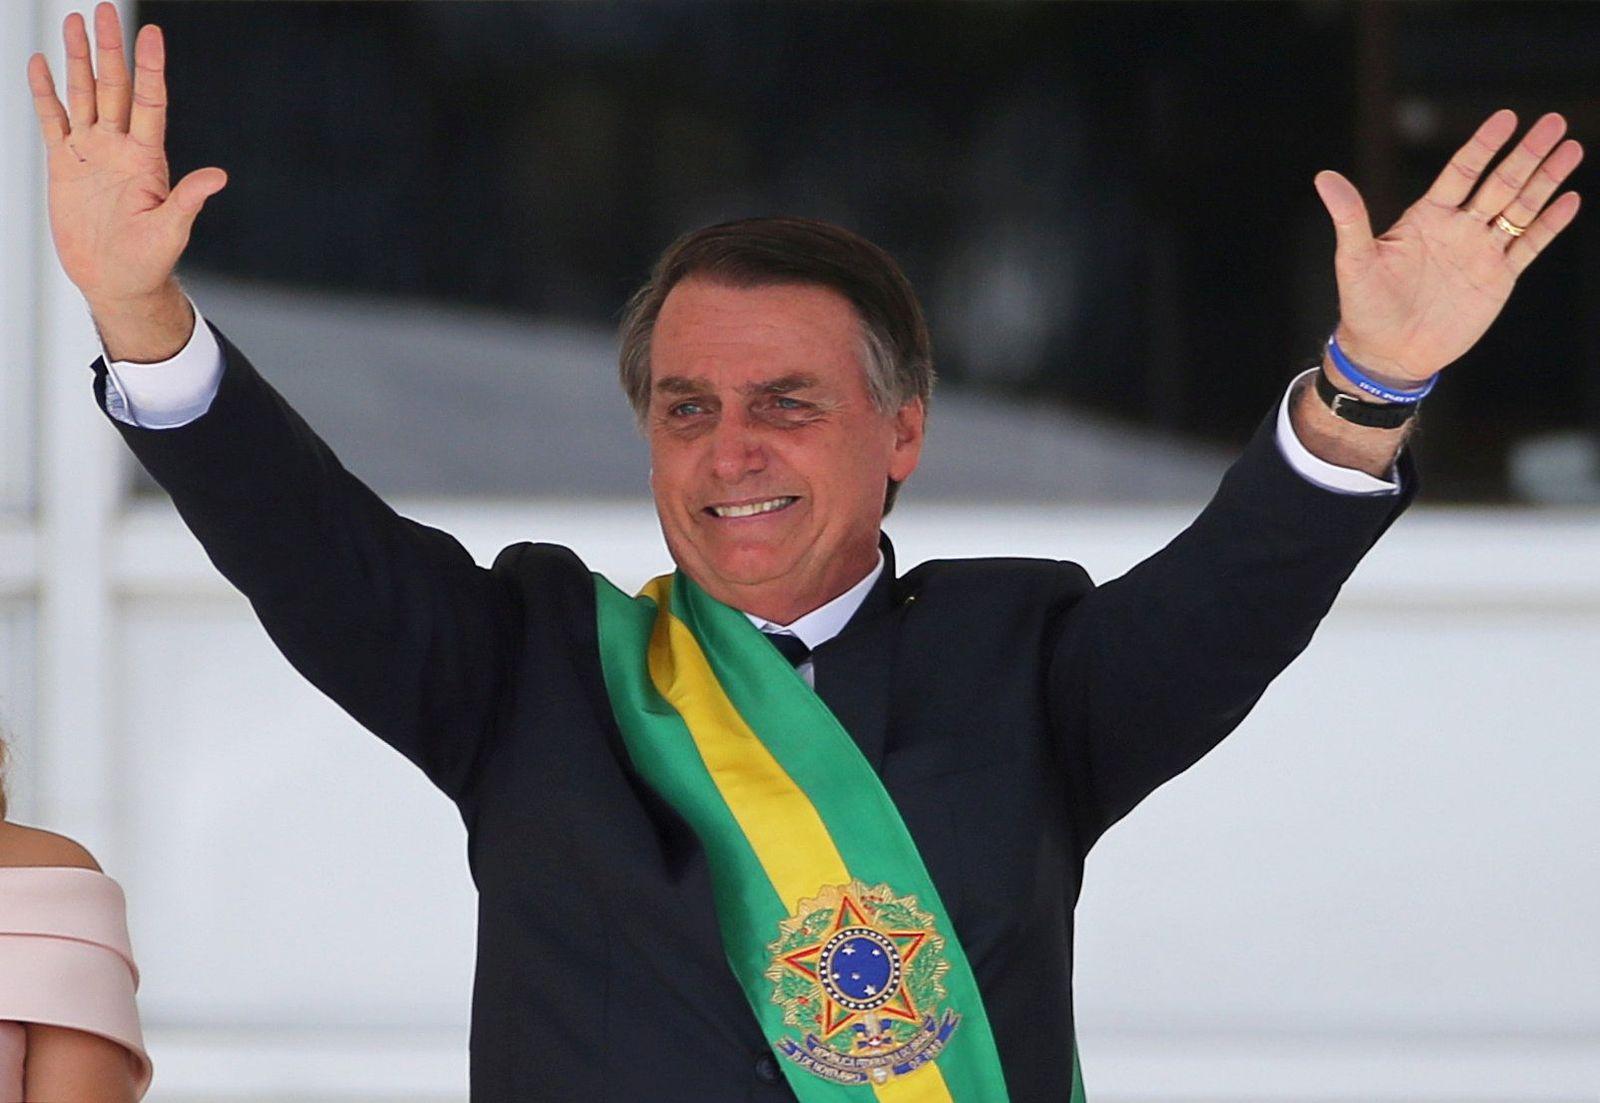 BRAZIL-POLITICS/AGRICULTURE